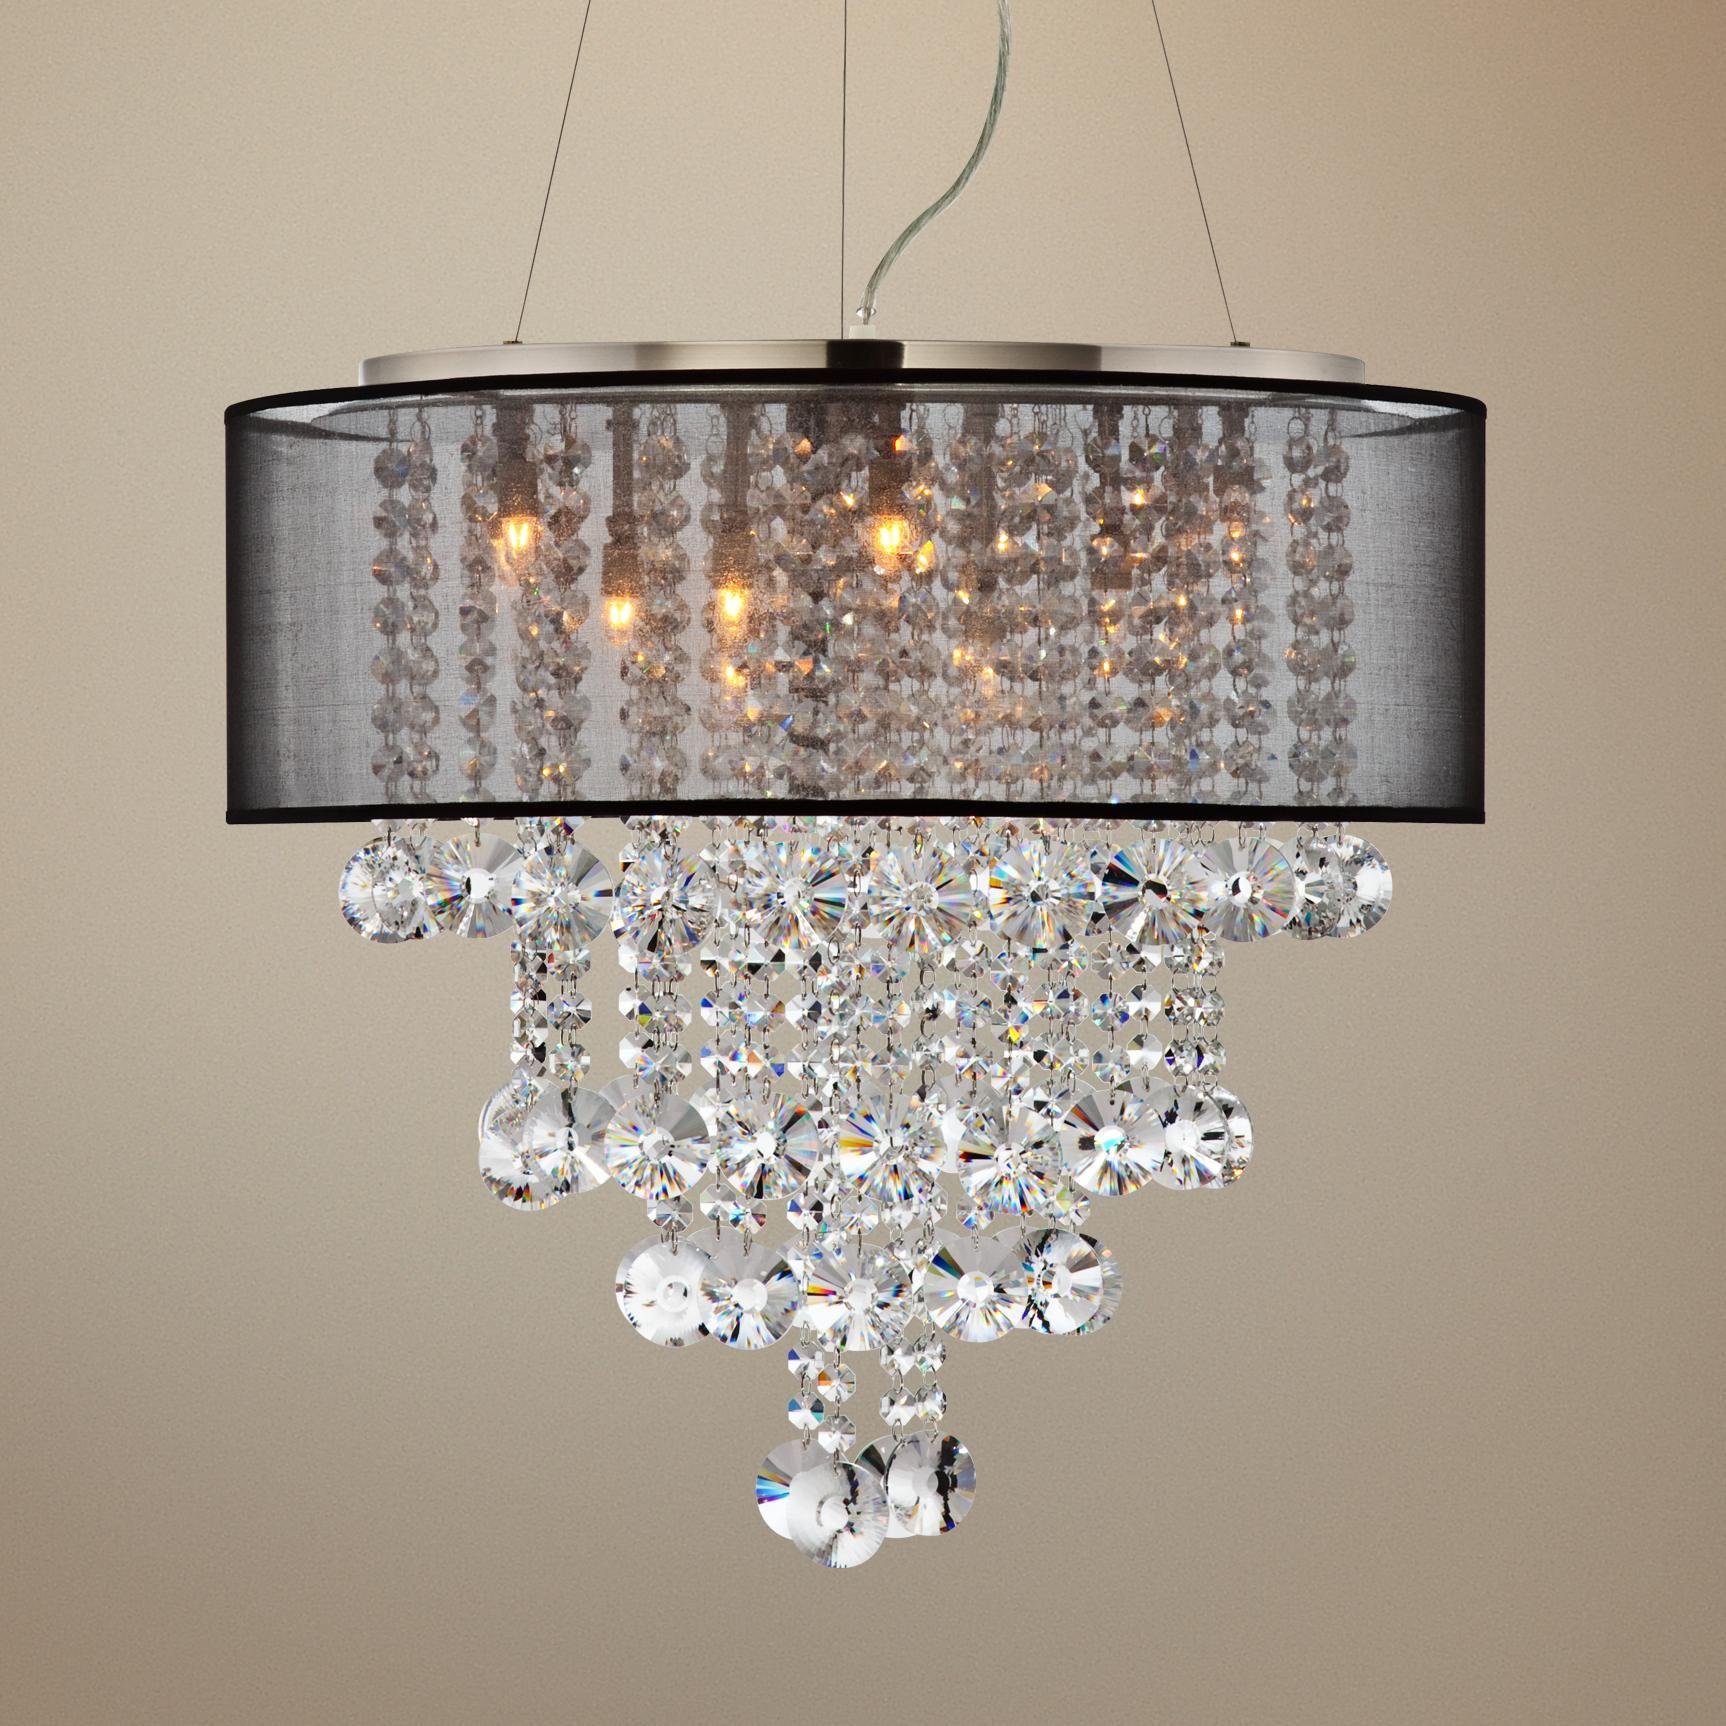 Possini Euro Brushed Nickel Black W Crystal Chandelier - Dining room crystal lighting